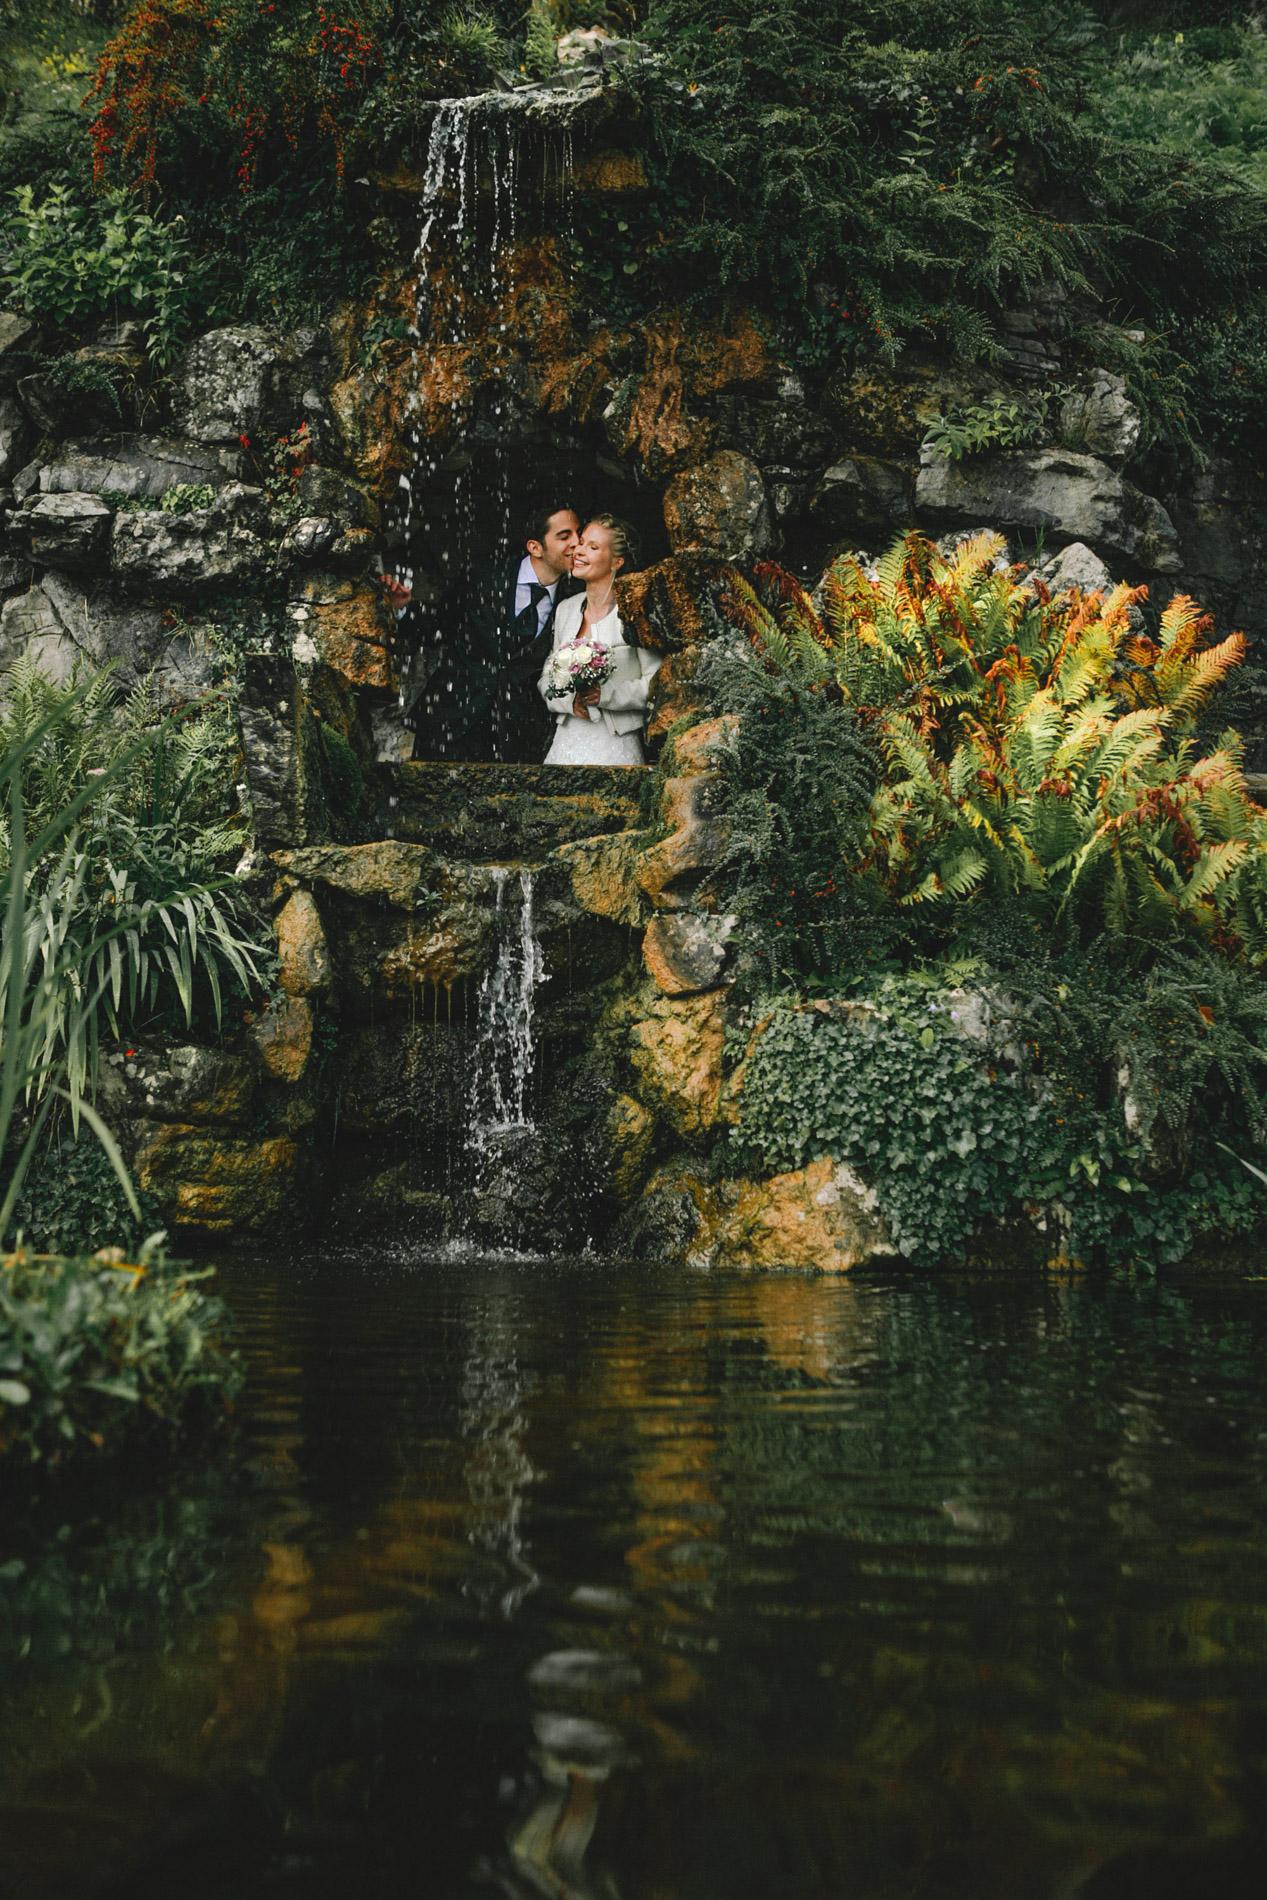 hochzeitsfotografie-schweiz_wedding-photographer-switzerland-europe_Bendik-Photography-024